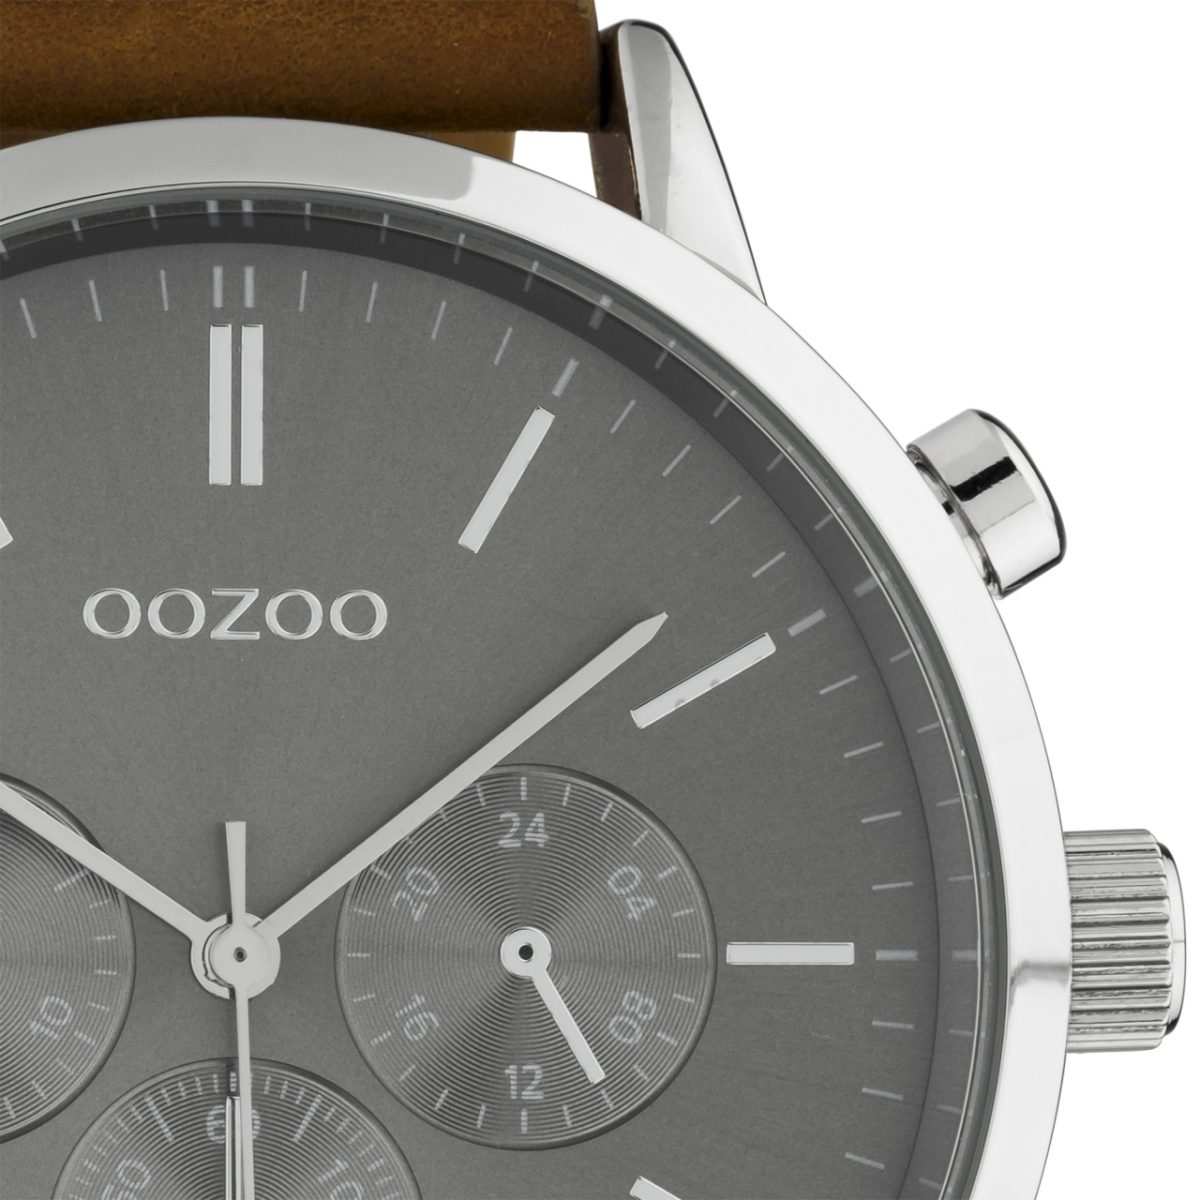 Timepieces Summer 2020 - C10541 - OOZOO